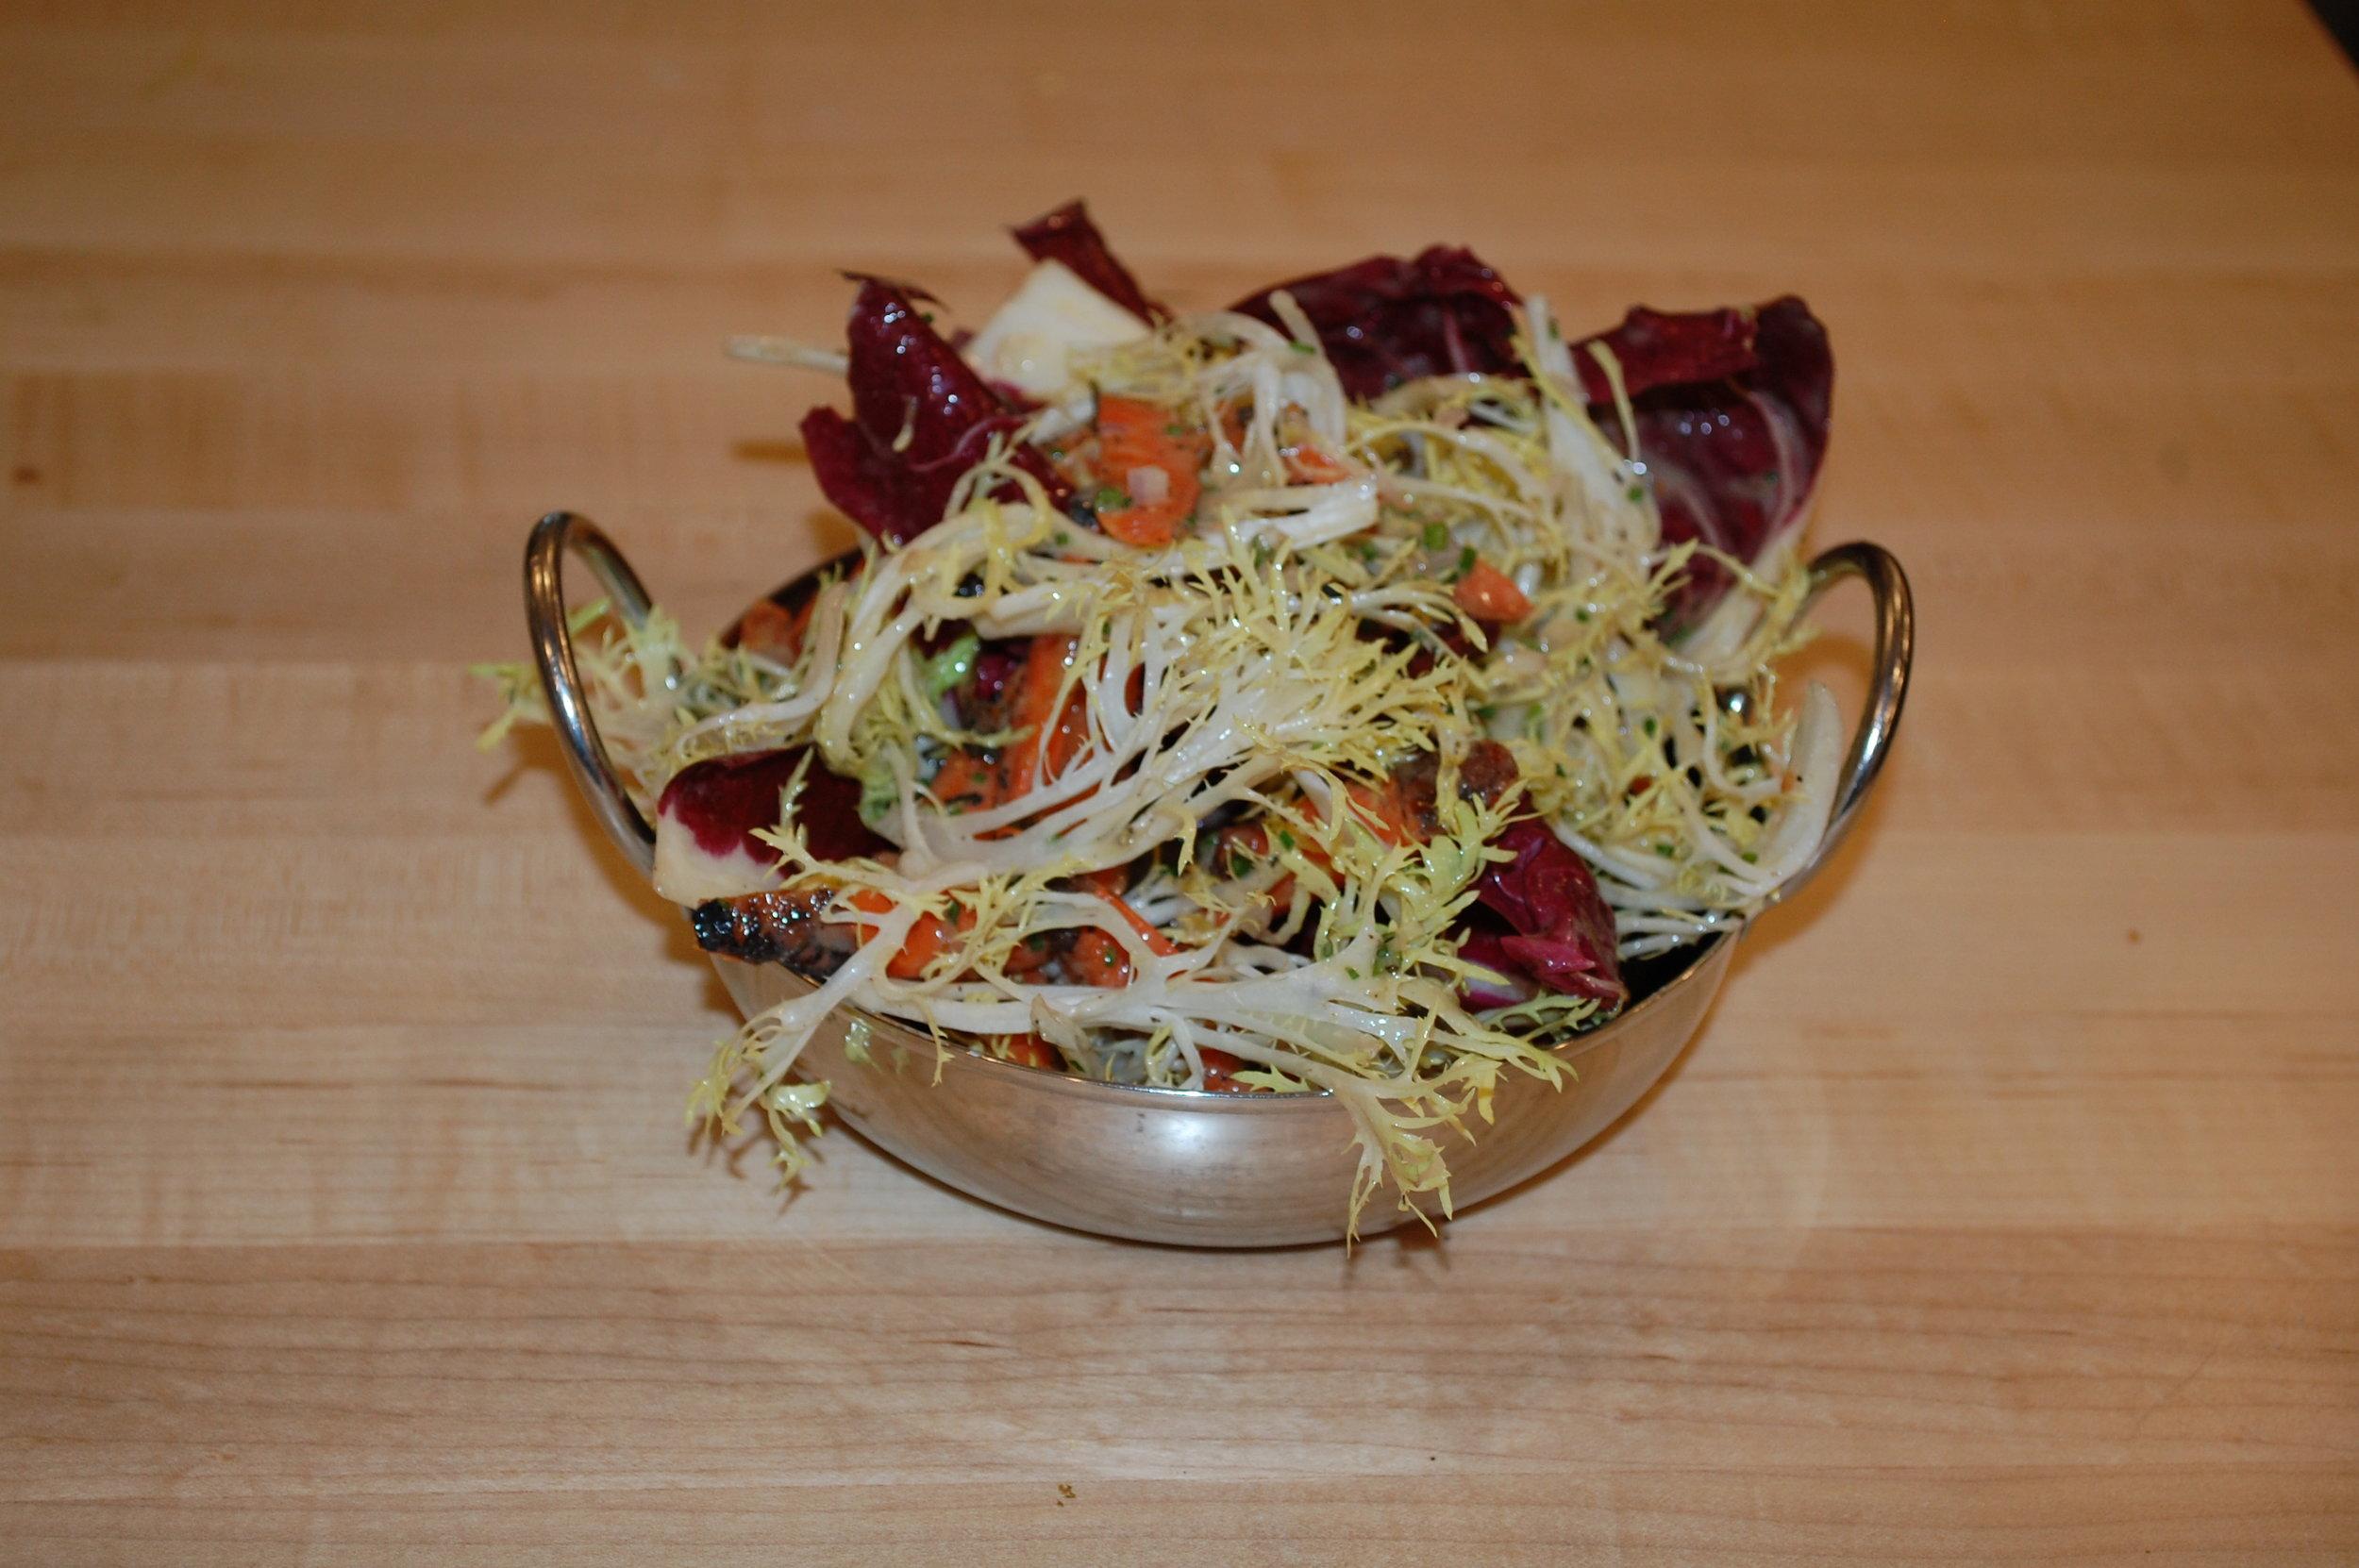 Local Roots Winter Greens, Charred Carrot, Sesame Blood Orange Vinaigrette